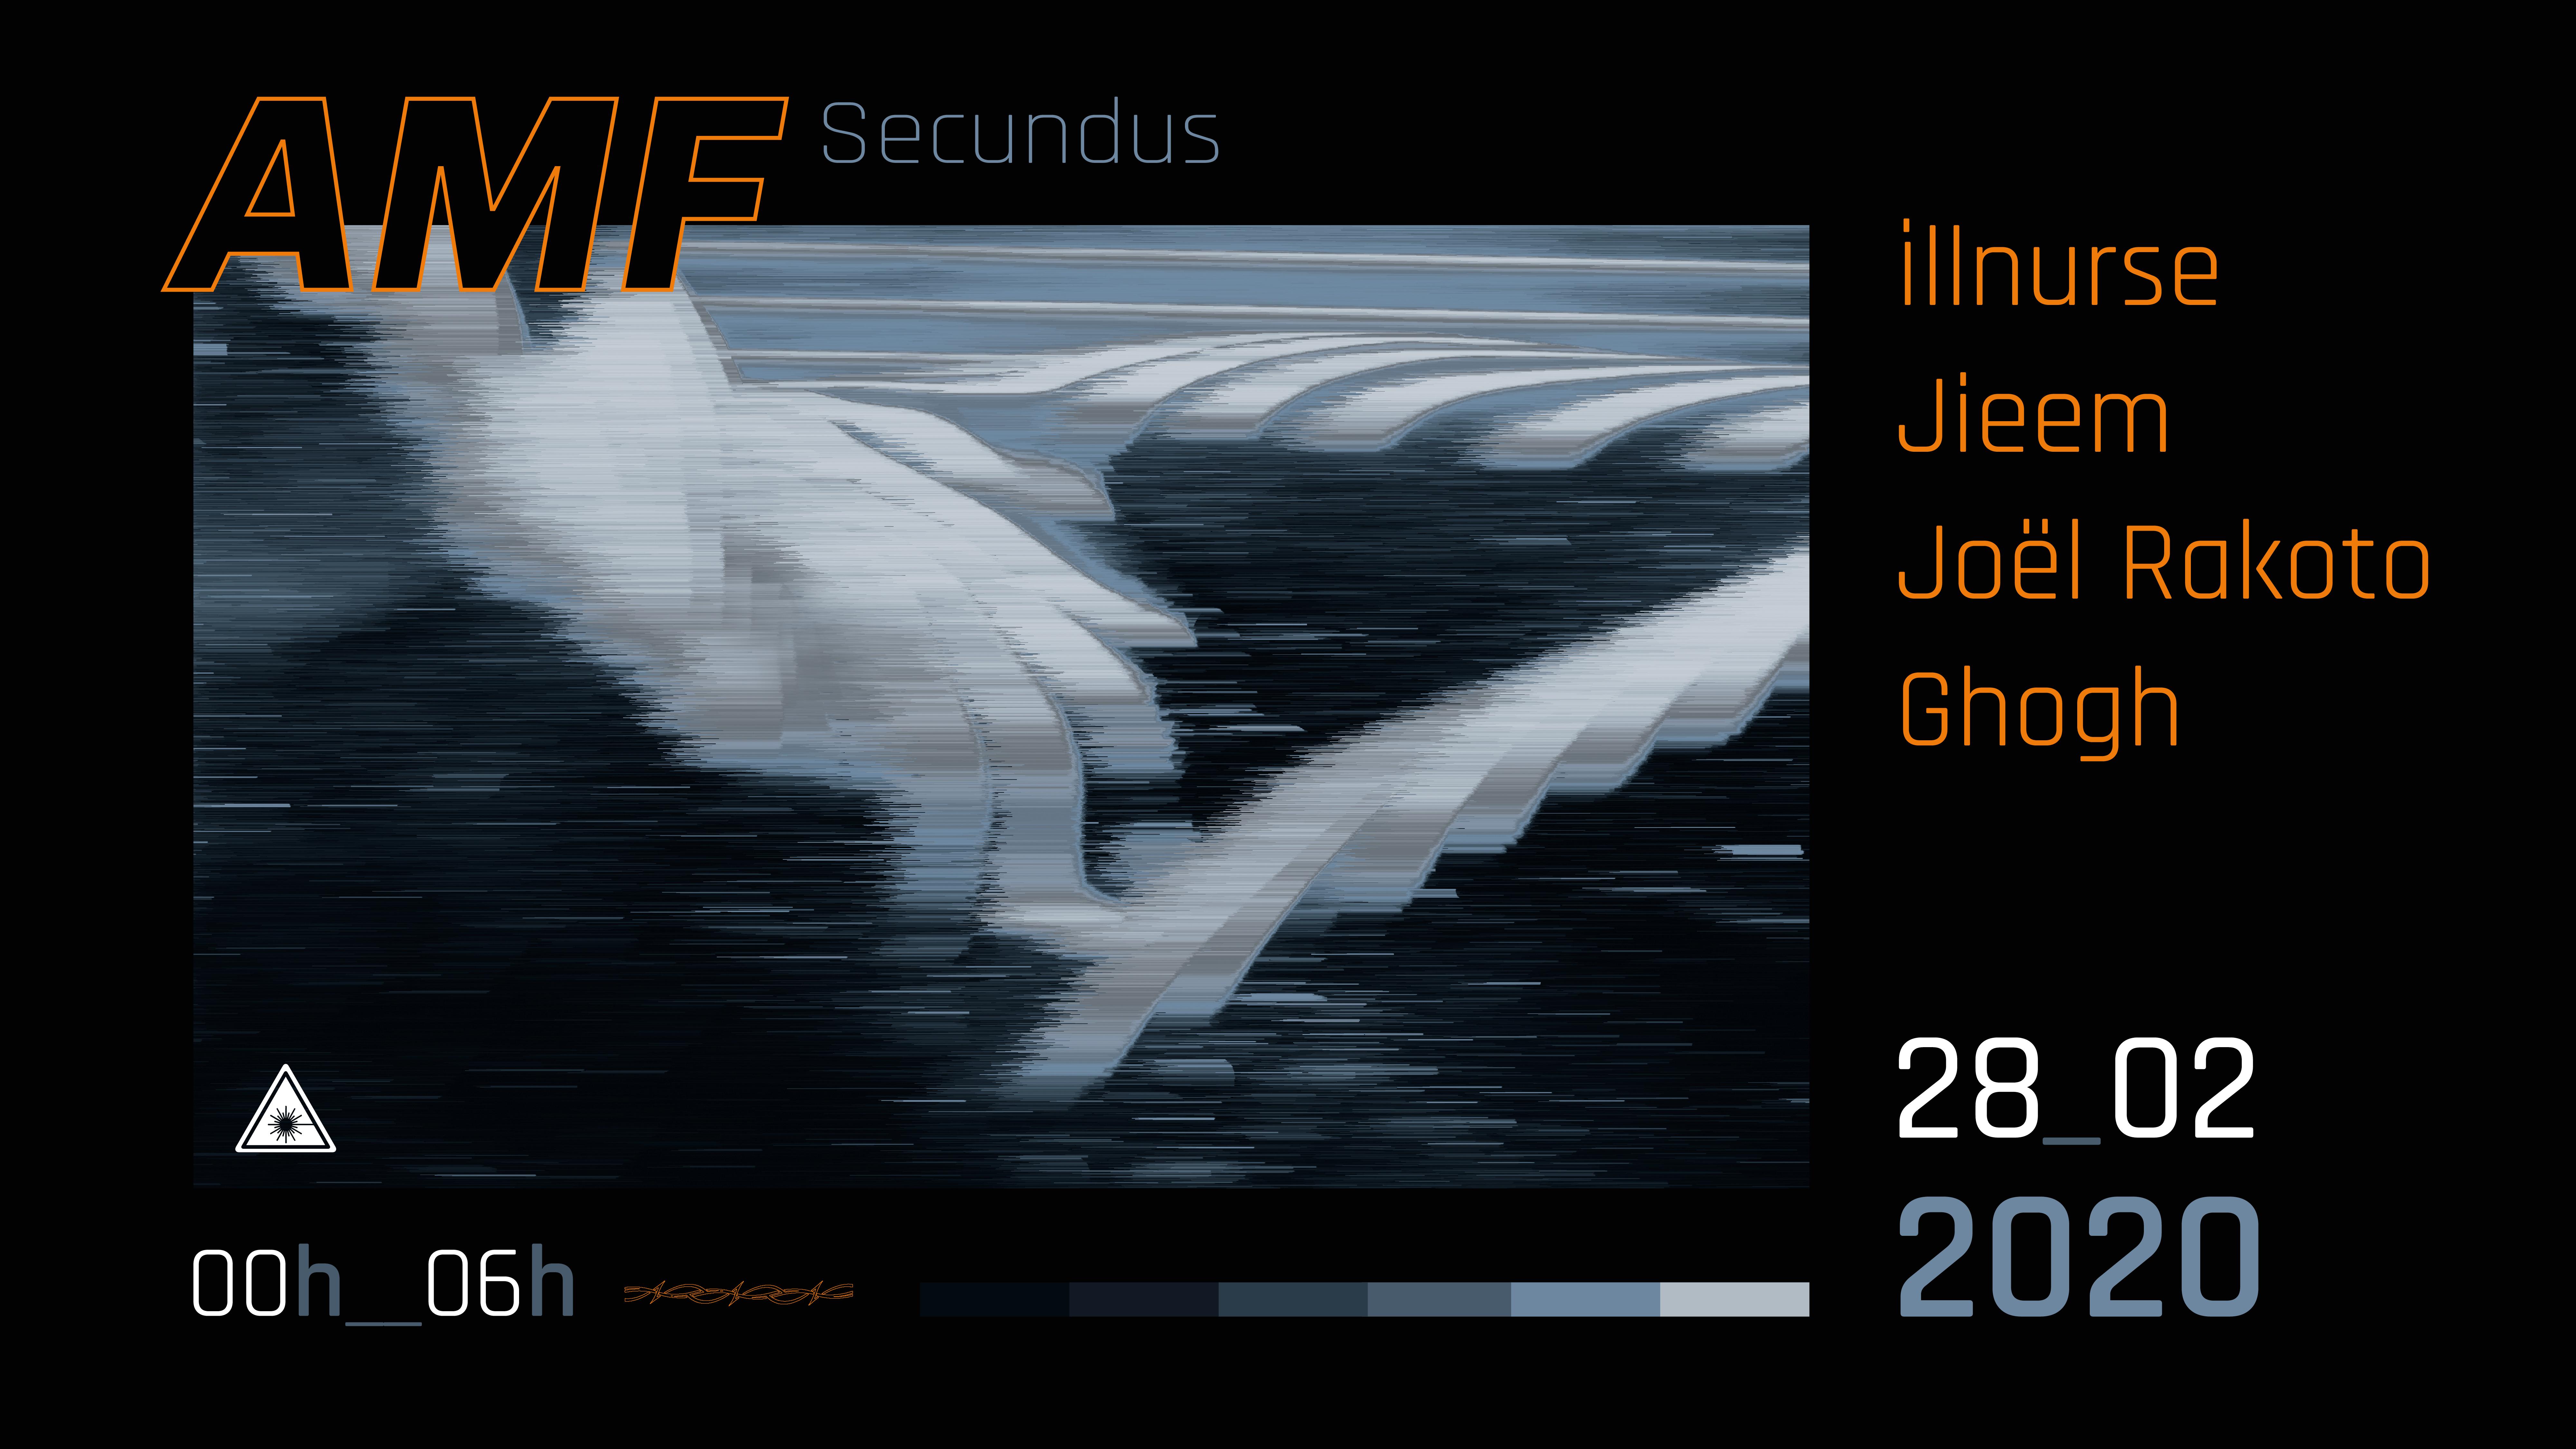 AMF : Secundus